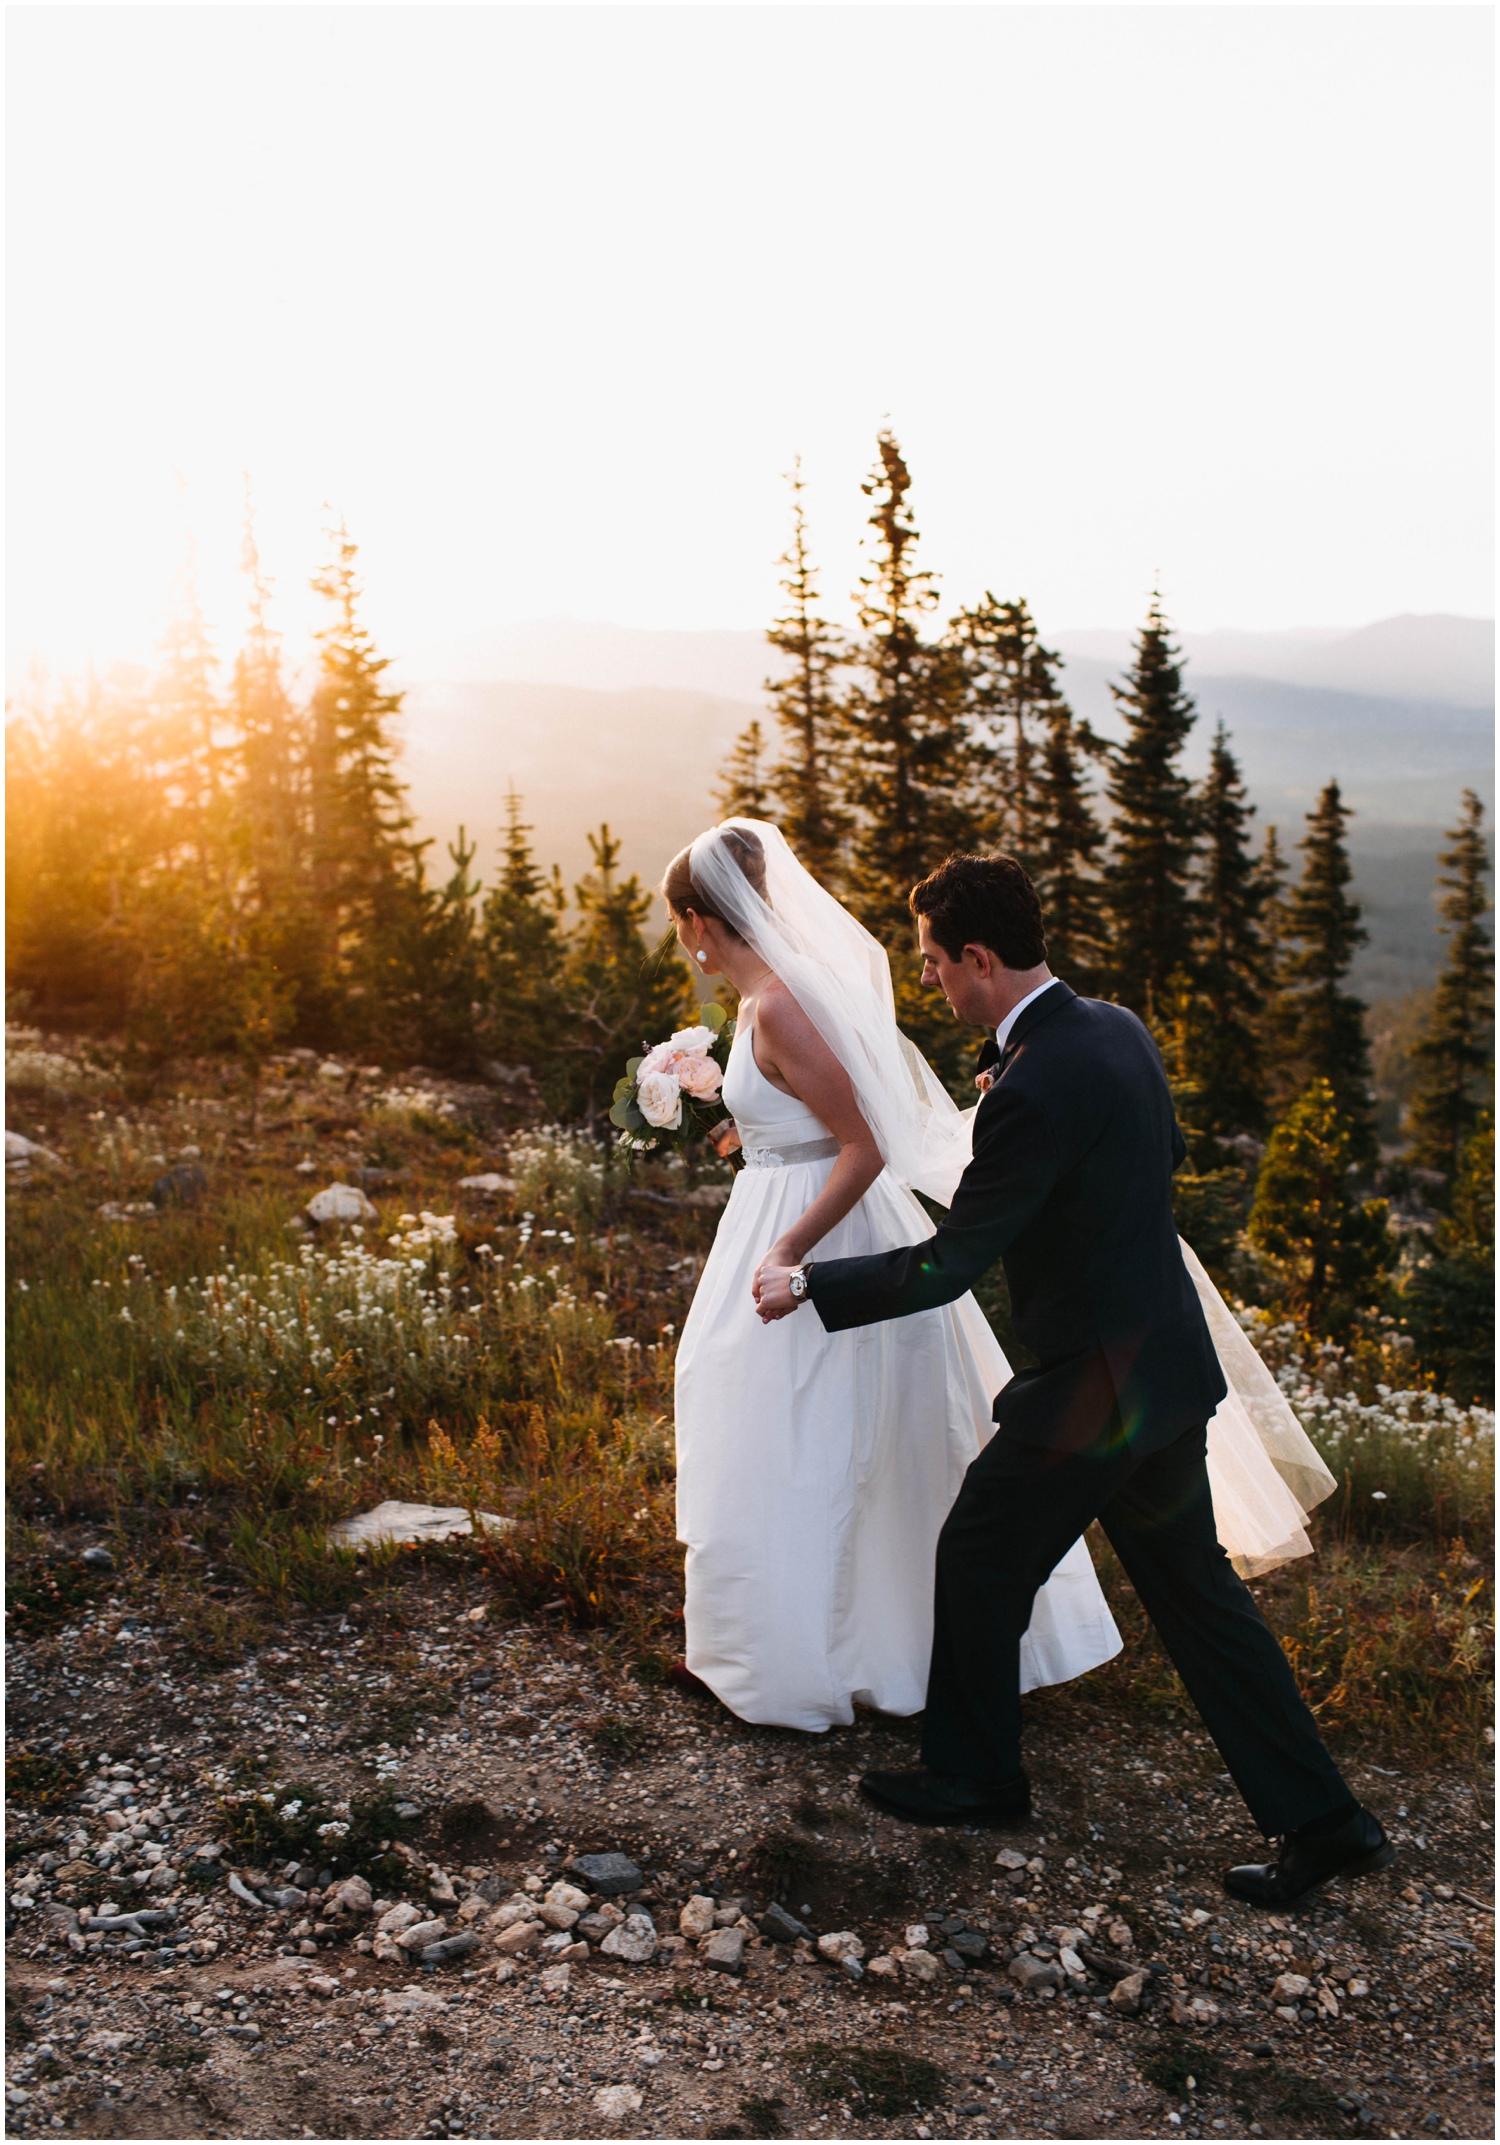 NadegeandJoe_elegant_winter_park_wedding_lodge_at_sunspot_mountain_taylor_powers_0215.jpg